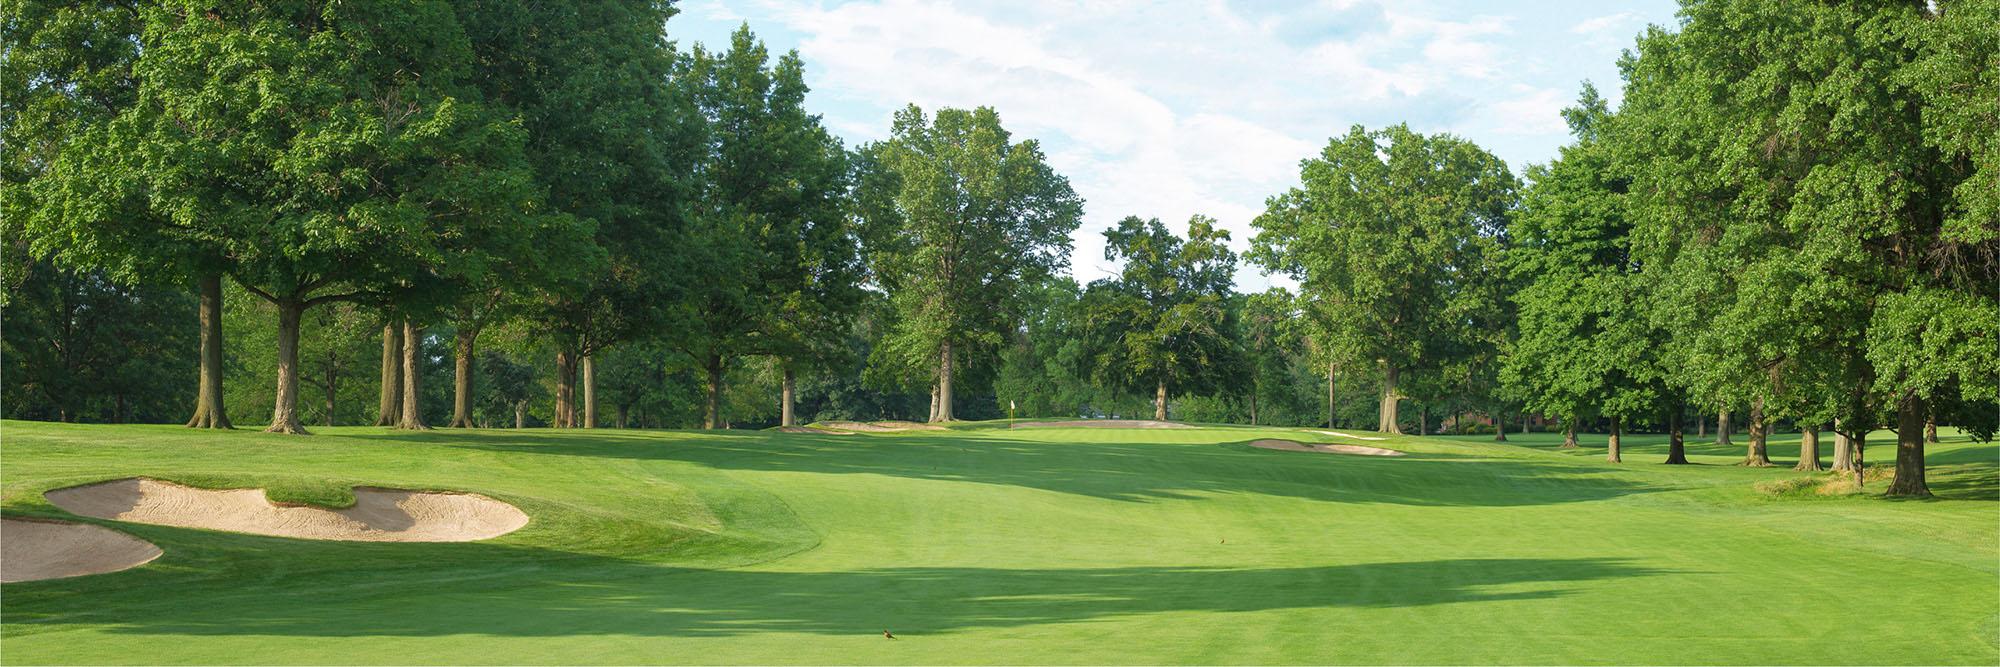 Golf Course Image - Canterbury No. 5